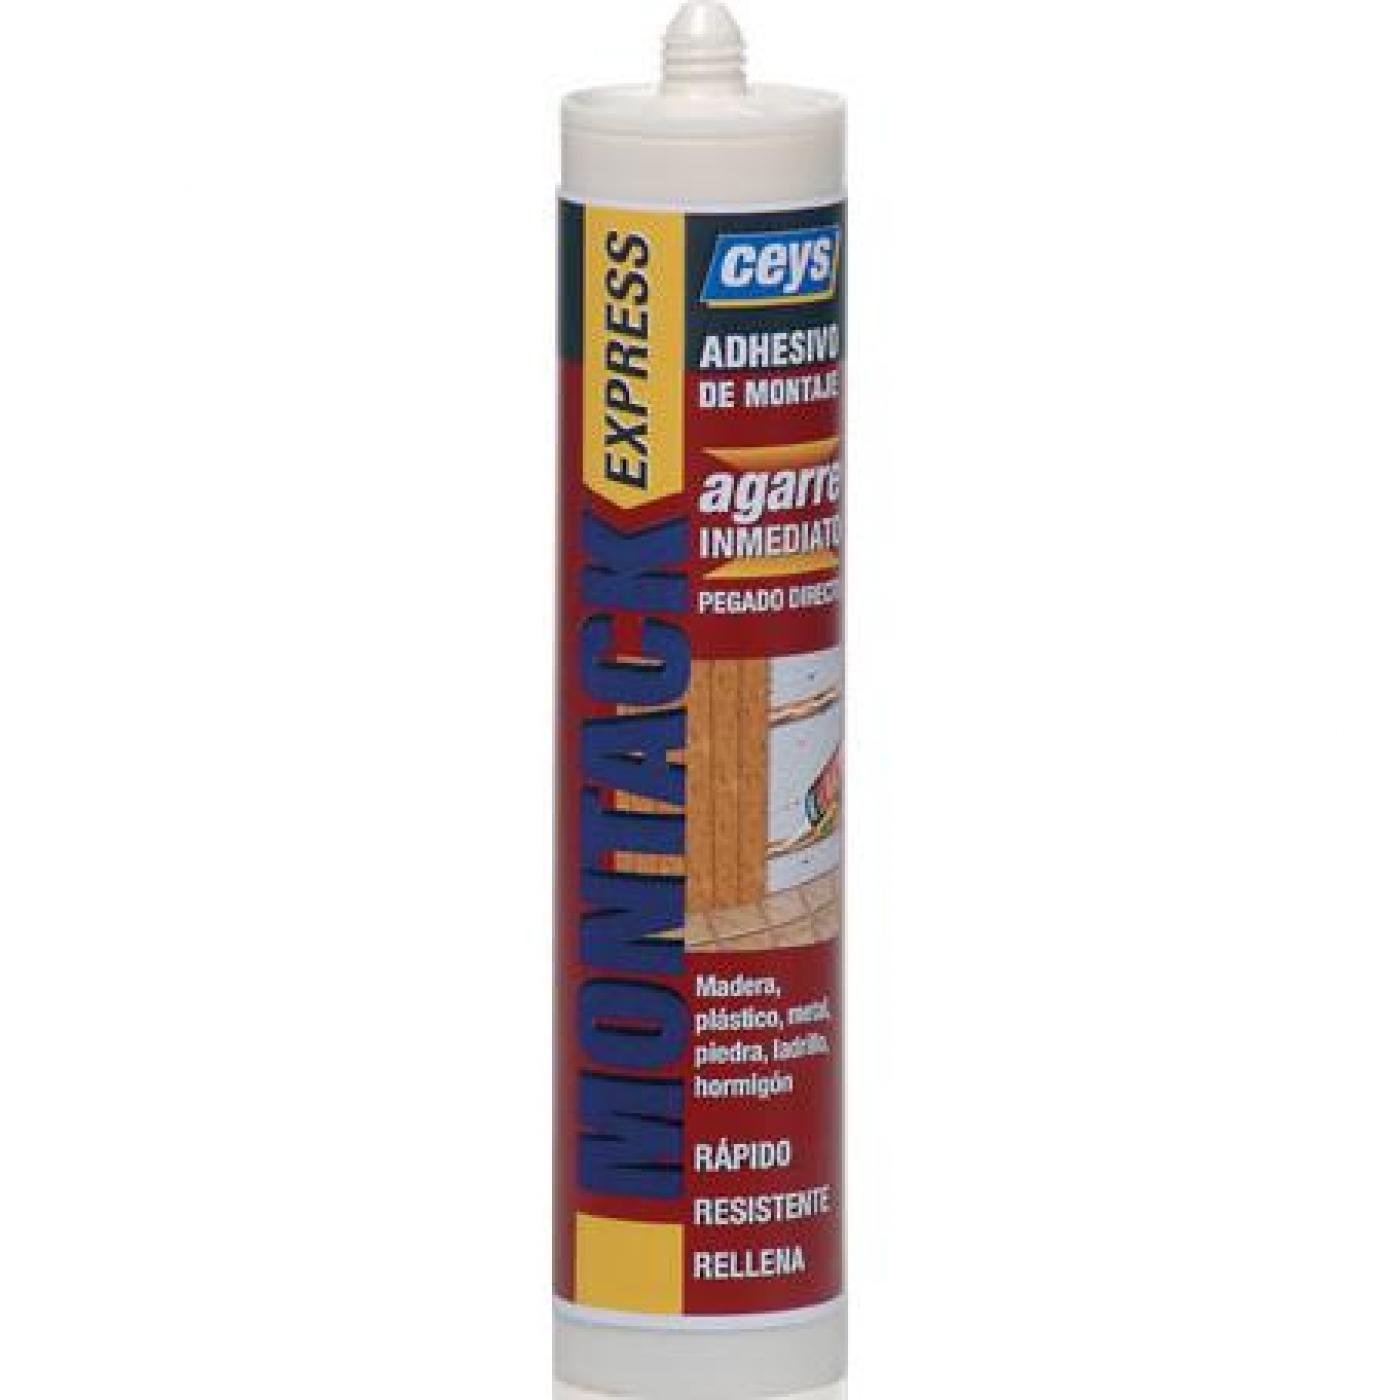 Aparador Relva Aki ~ Adhesivo de montaje express Ceys Montack cartucho 300 ml por 7,81 u20ac en Planeta Huerto